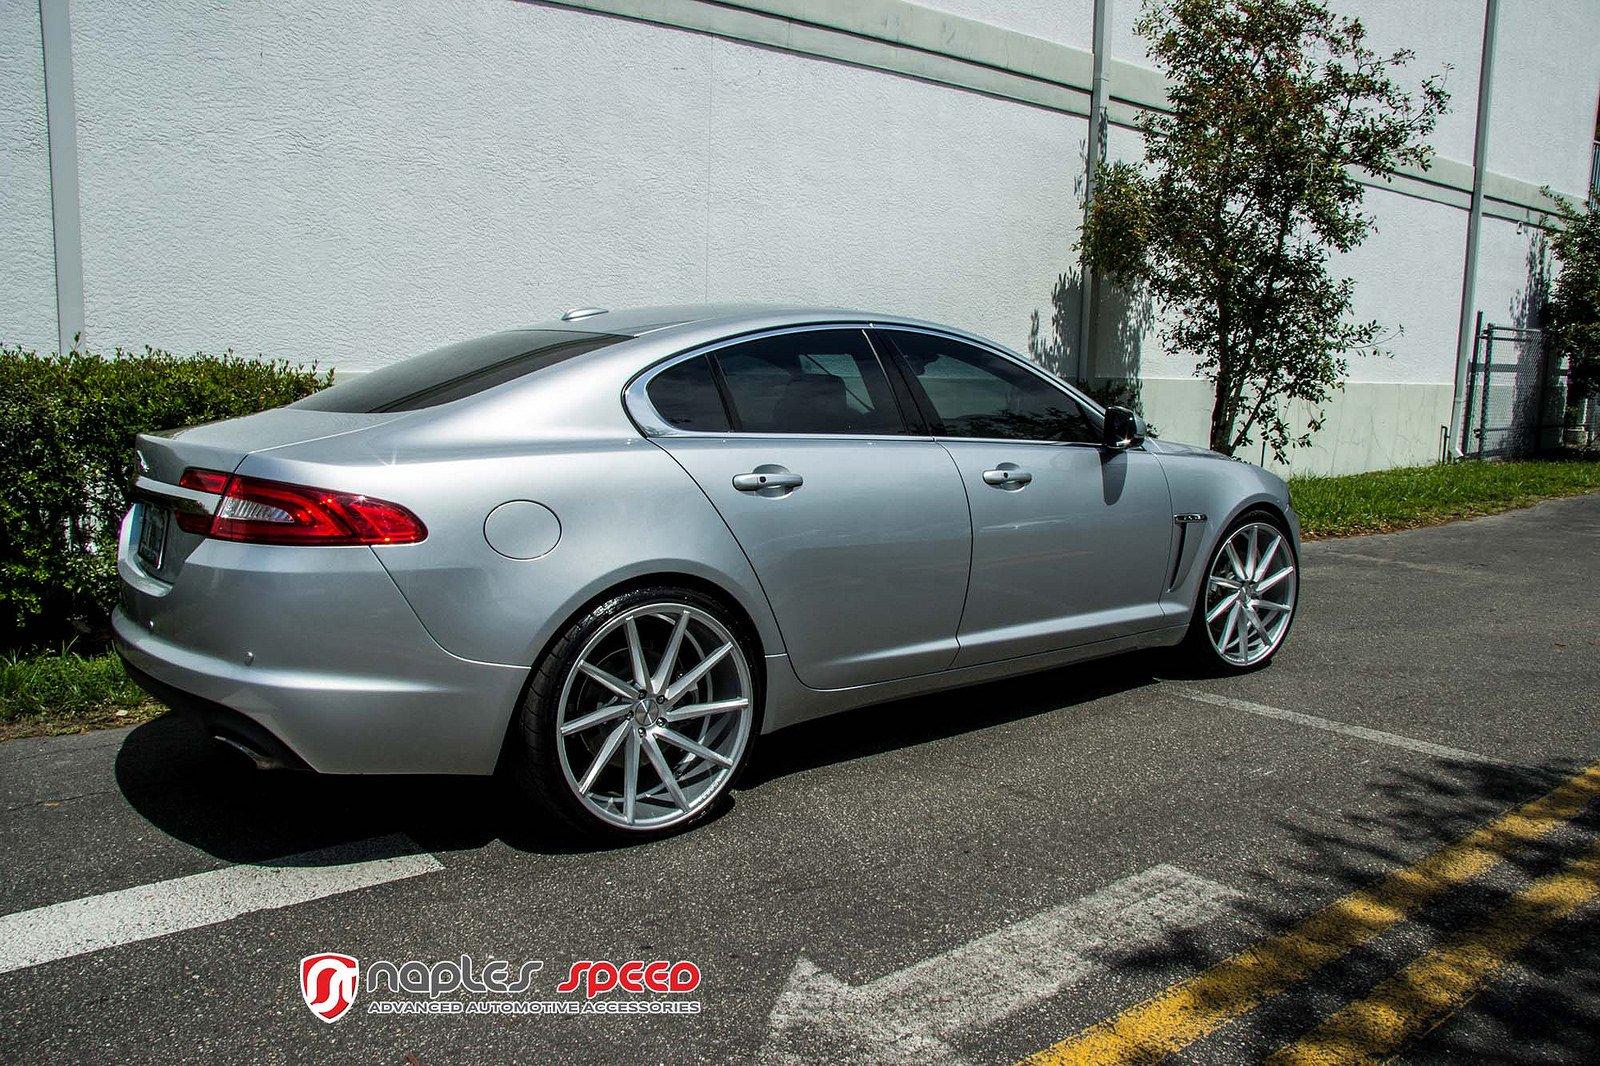 vossen wheels jaguar xf tuning cars wallpaper 1600x1066 664341 wallpaperup. Black Bedroom Furniture Sets. Home Design Ideas